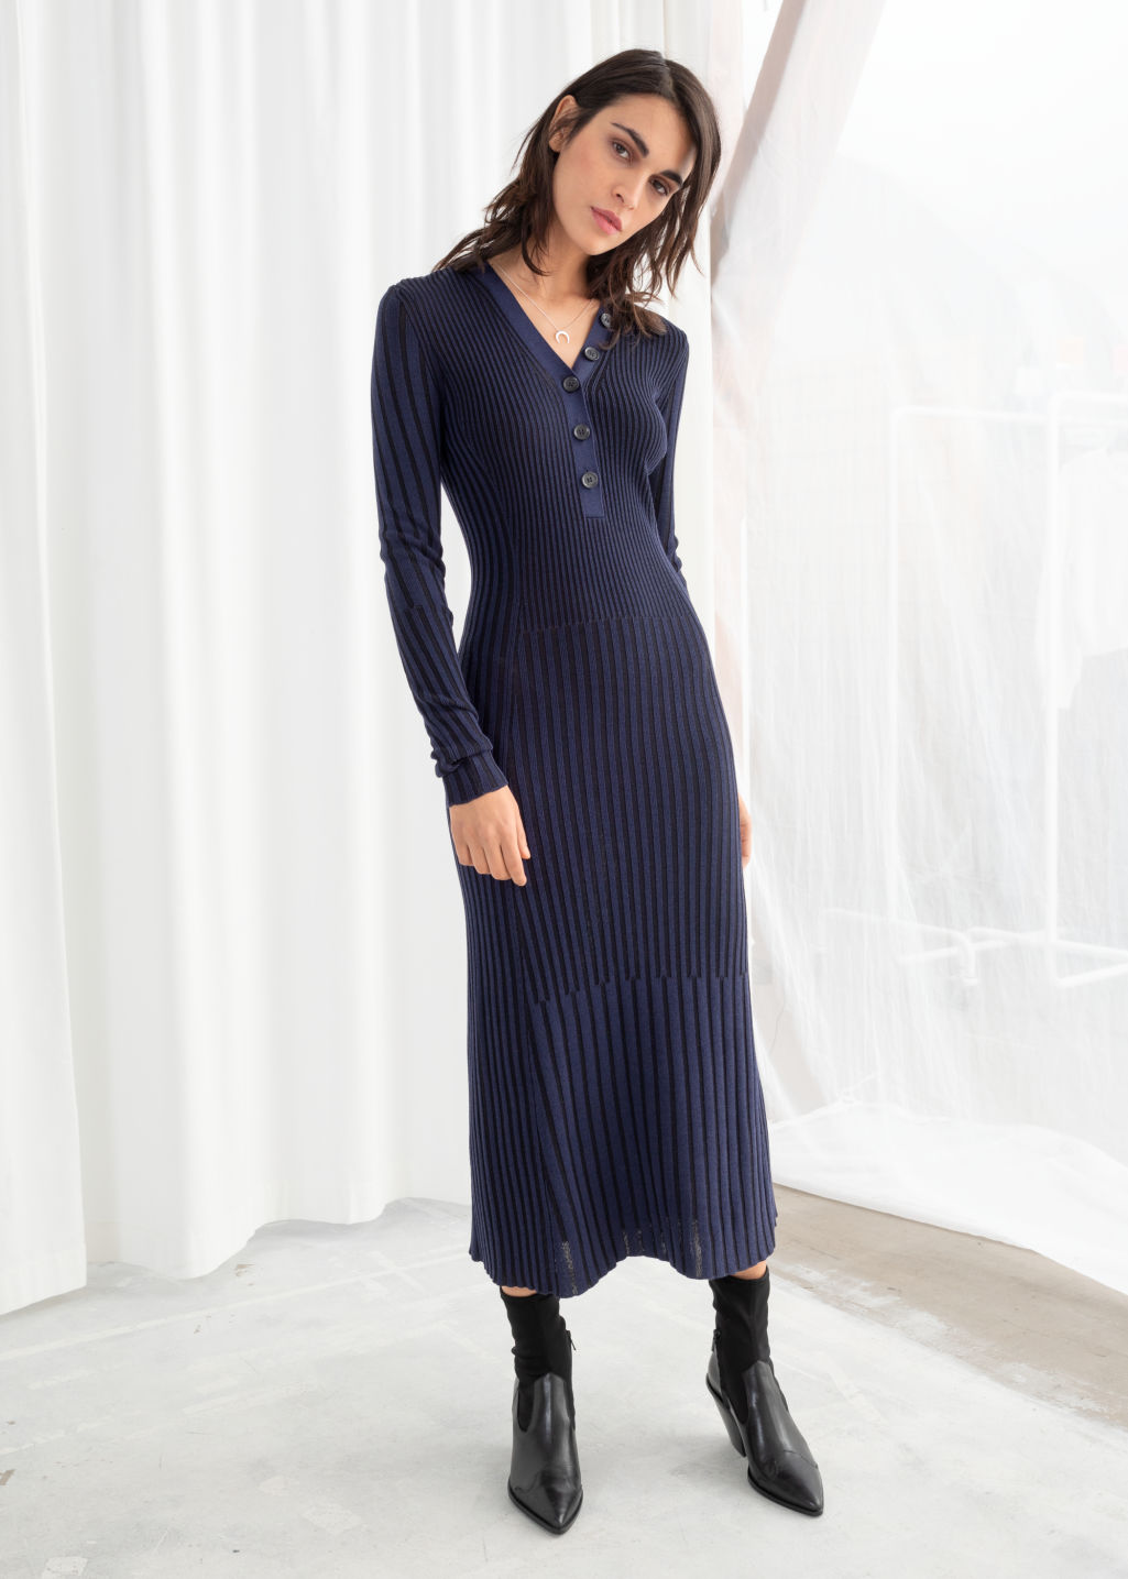 8d791e7f67ba Rib Knit Midi Dress - Blue Black - Midi dresses -   Other Stories